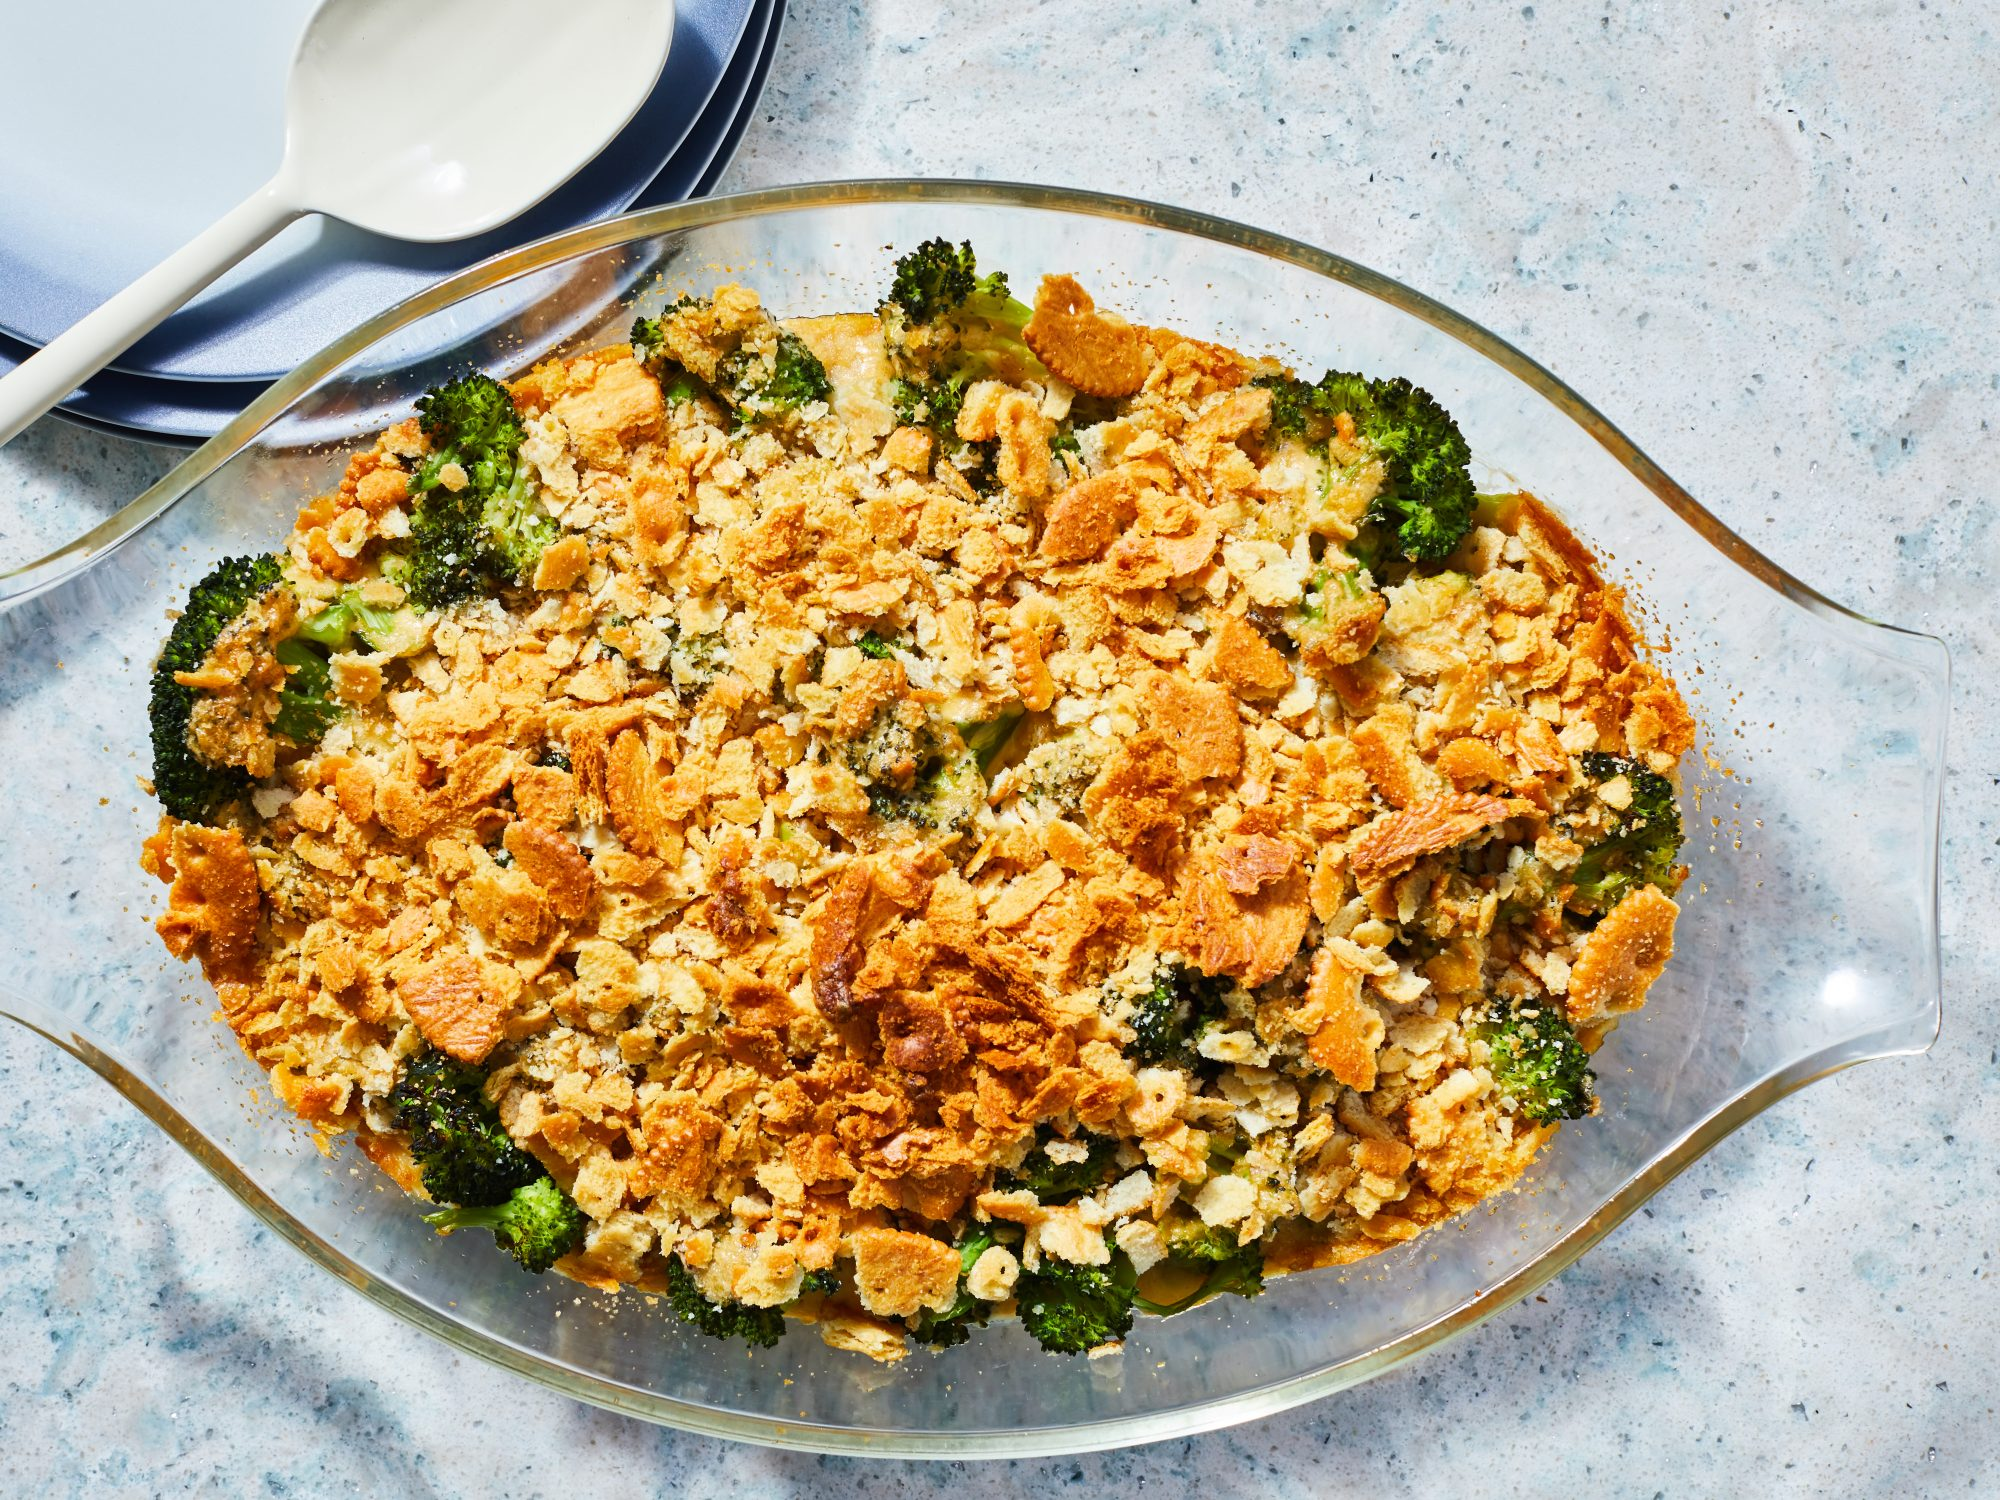 MR_051019_BroccoliCasserole200.jpg